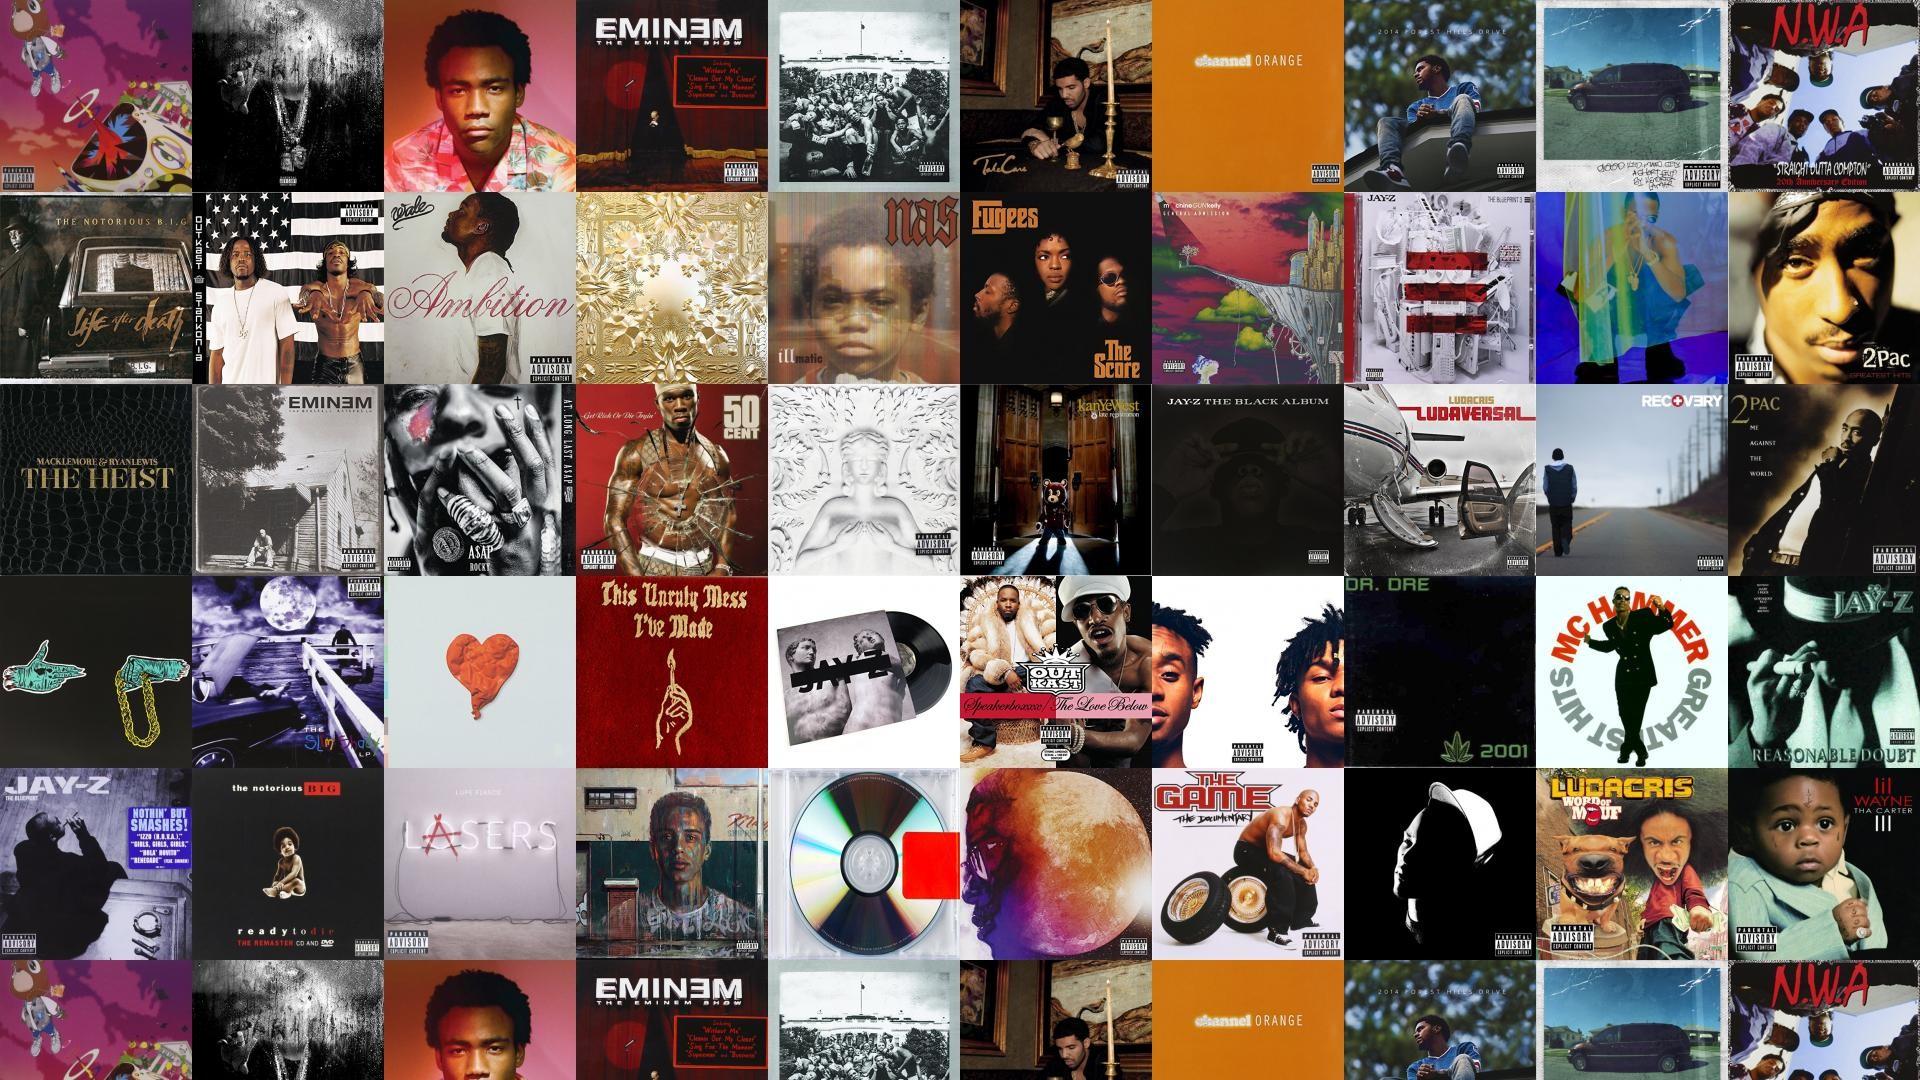 Download this free wallpaper with images of Kanye West – Graduation, Big  Sean – Dark, Childish – Because, Eminem – The Eminem Show, Kendrick – To  Pimp, …